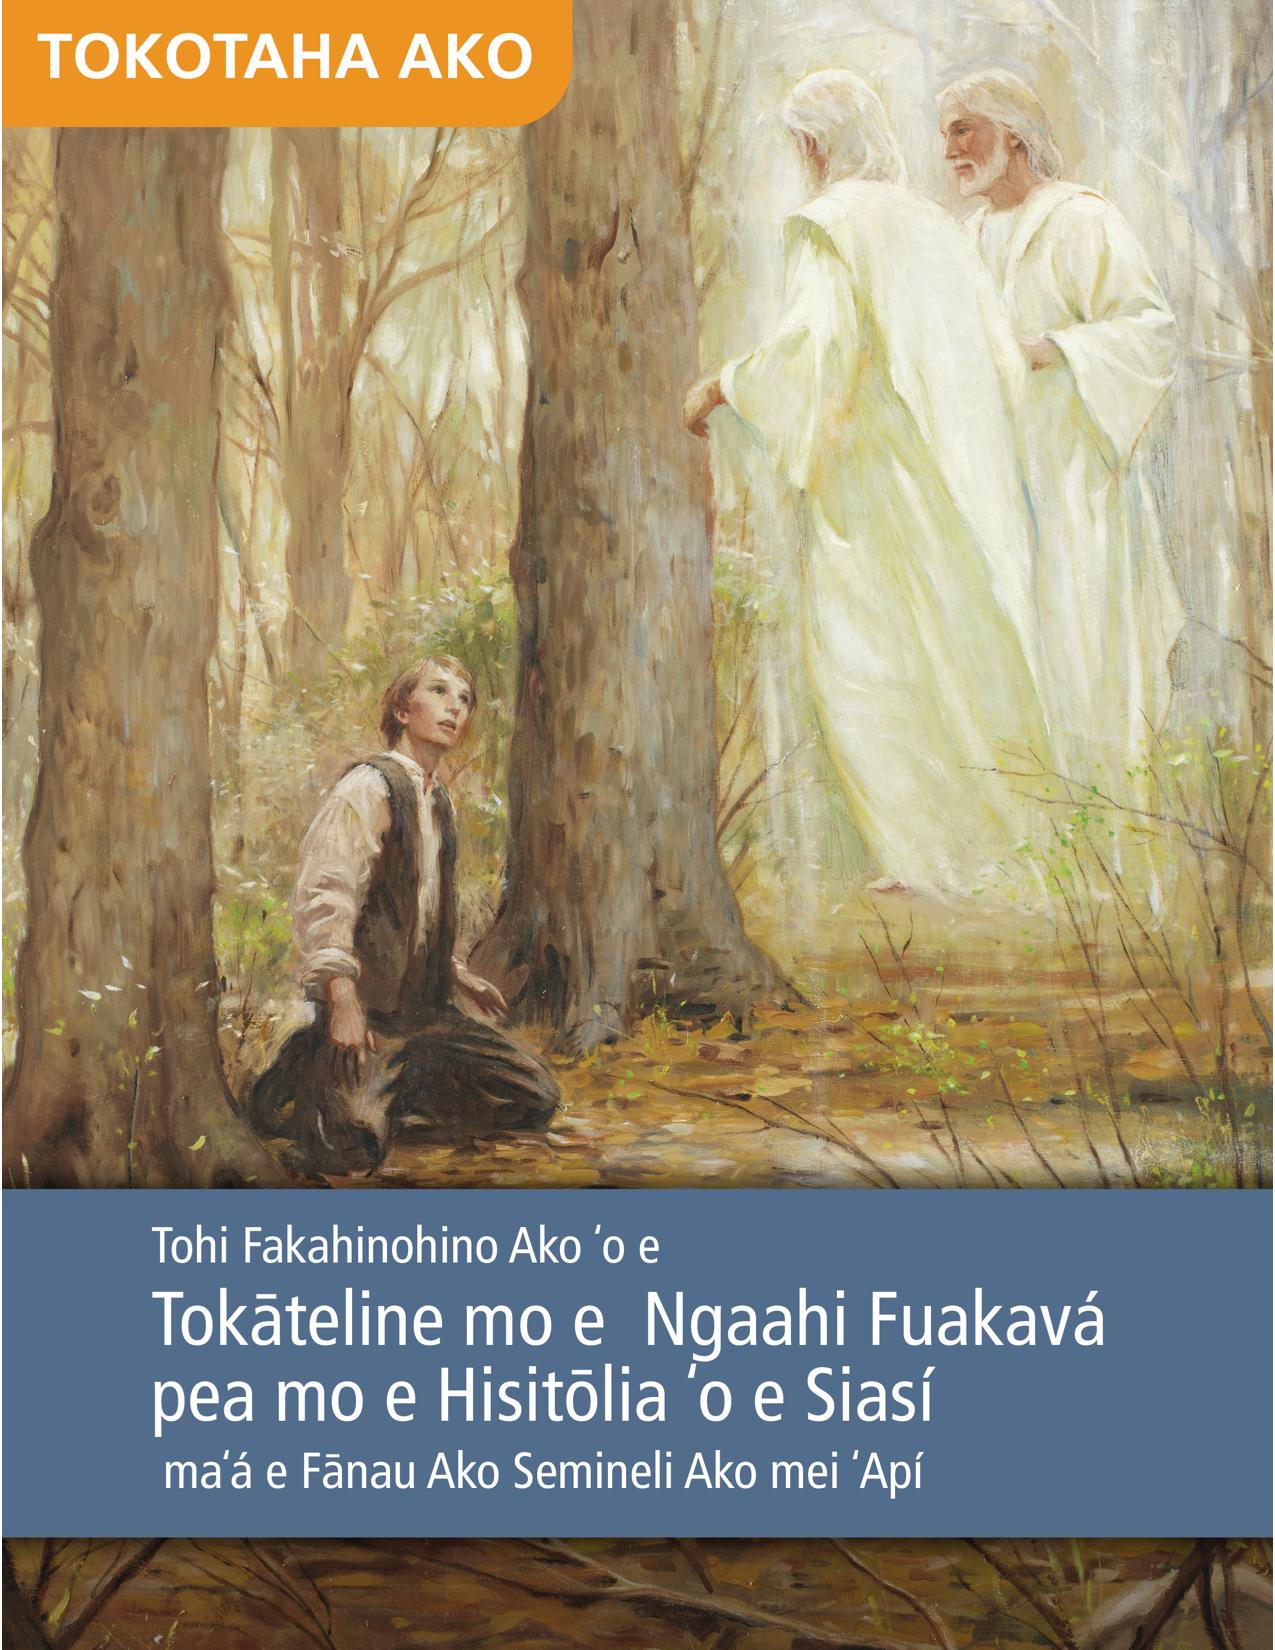 Tohi Fakahinohino Ako ʻo e Tokāteline mo e Ngaahi Fuakavá pea mo e Hisitōlia ʻo e Siasí maʻá e Fānau Ako Semineli Ako mei ʻApí